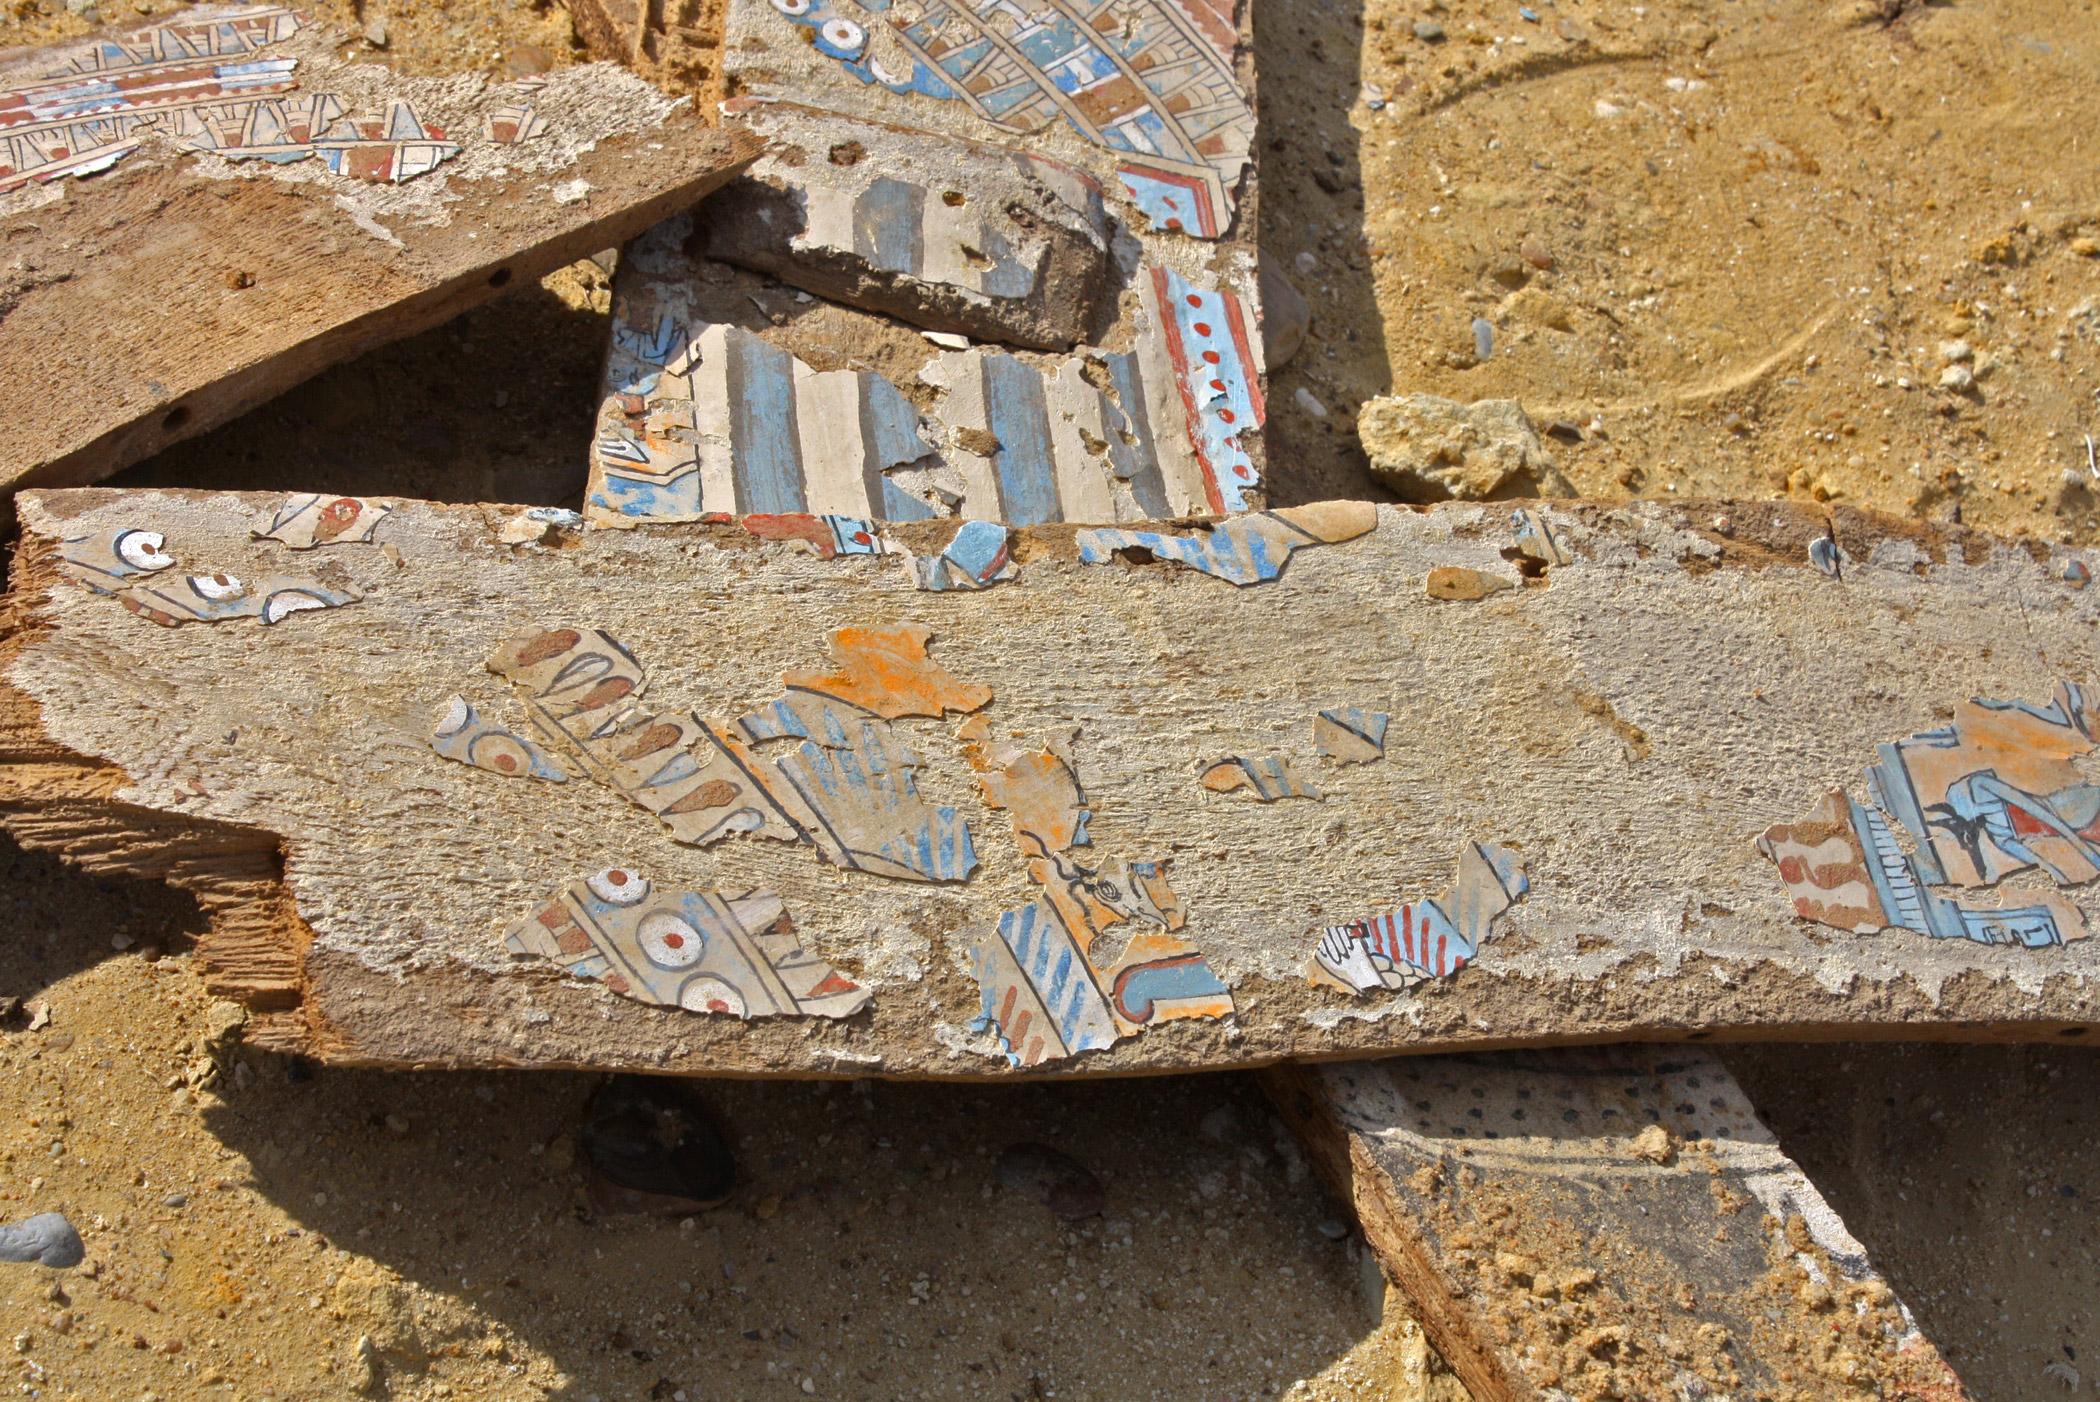 Egypt, Abusir el-Malek: Looting archaeological sites like Abusir el-Malek erases irreplaceable information about human history and cultural milestones